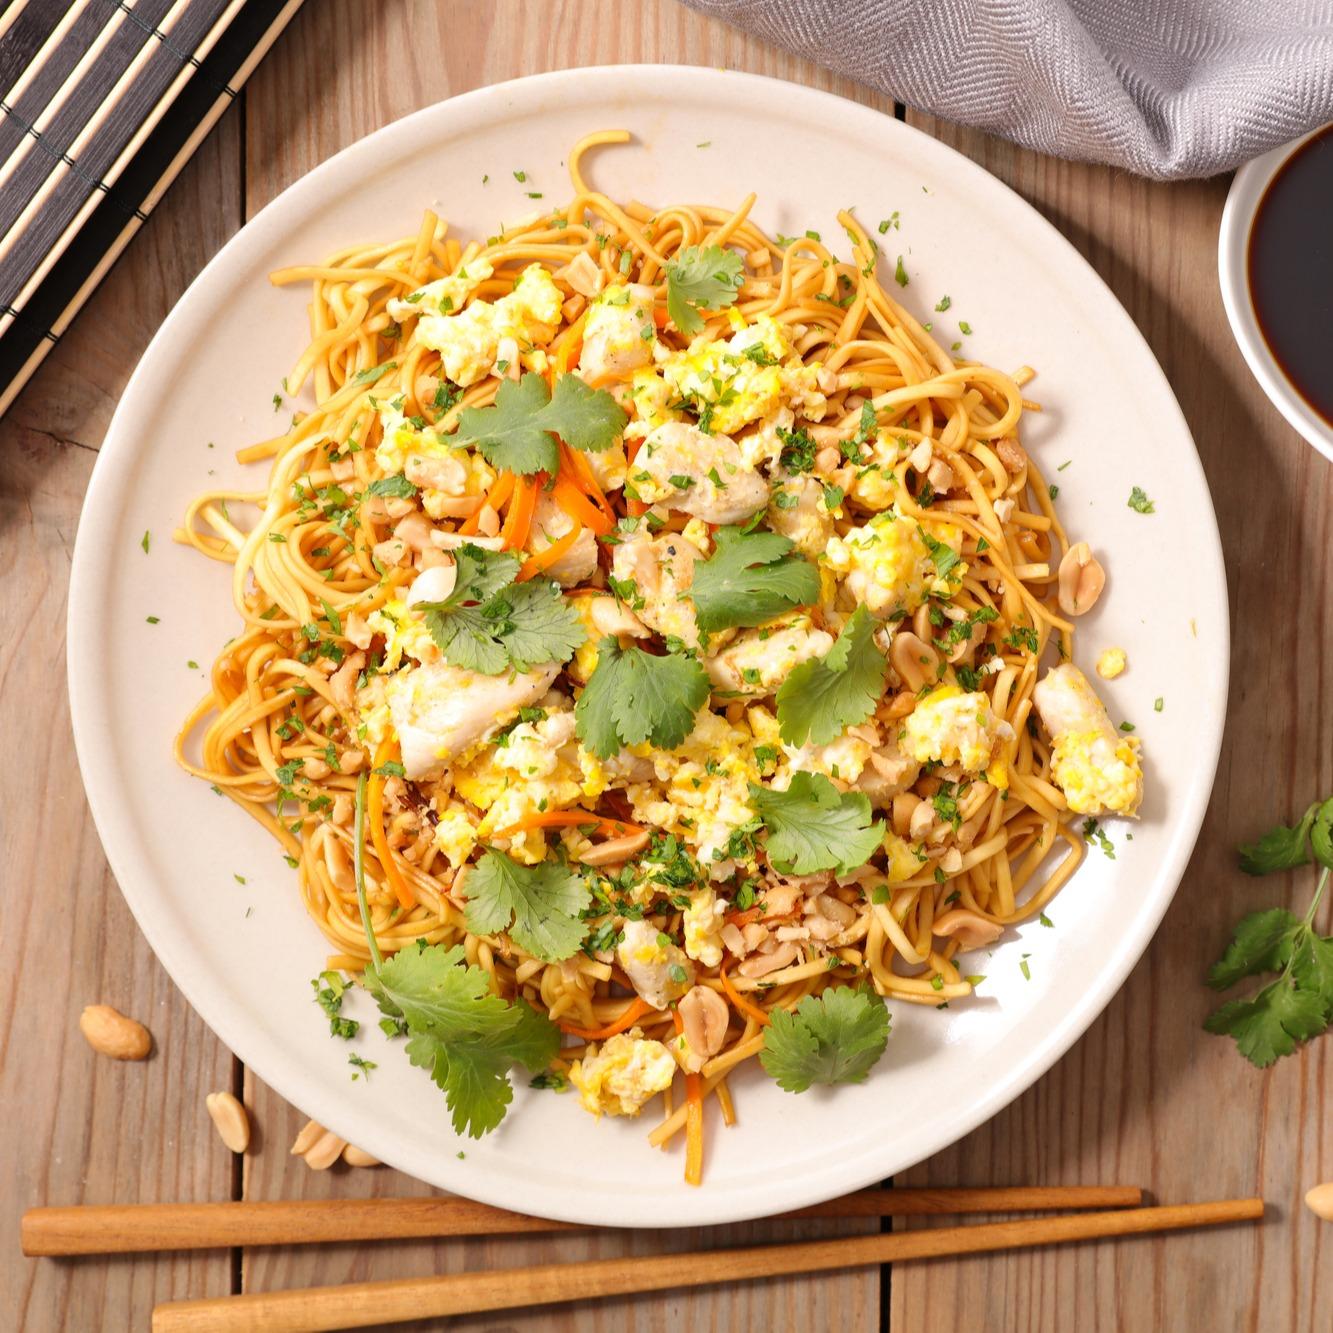 Fall-butternut-squash-chicken-stir-fry-noodle-recipe (1)